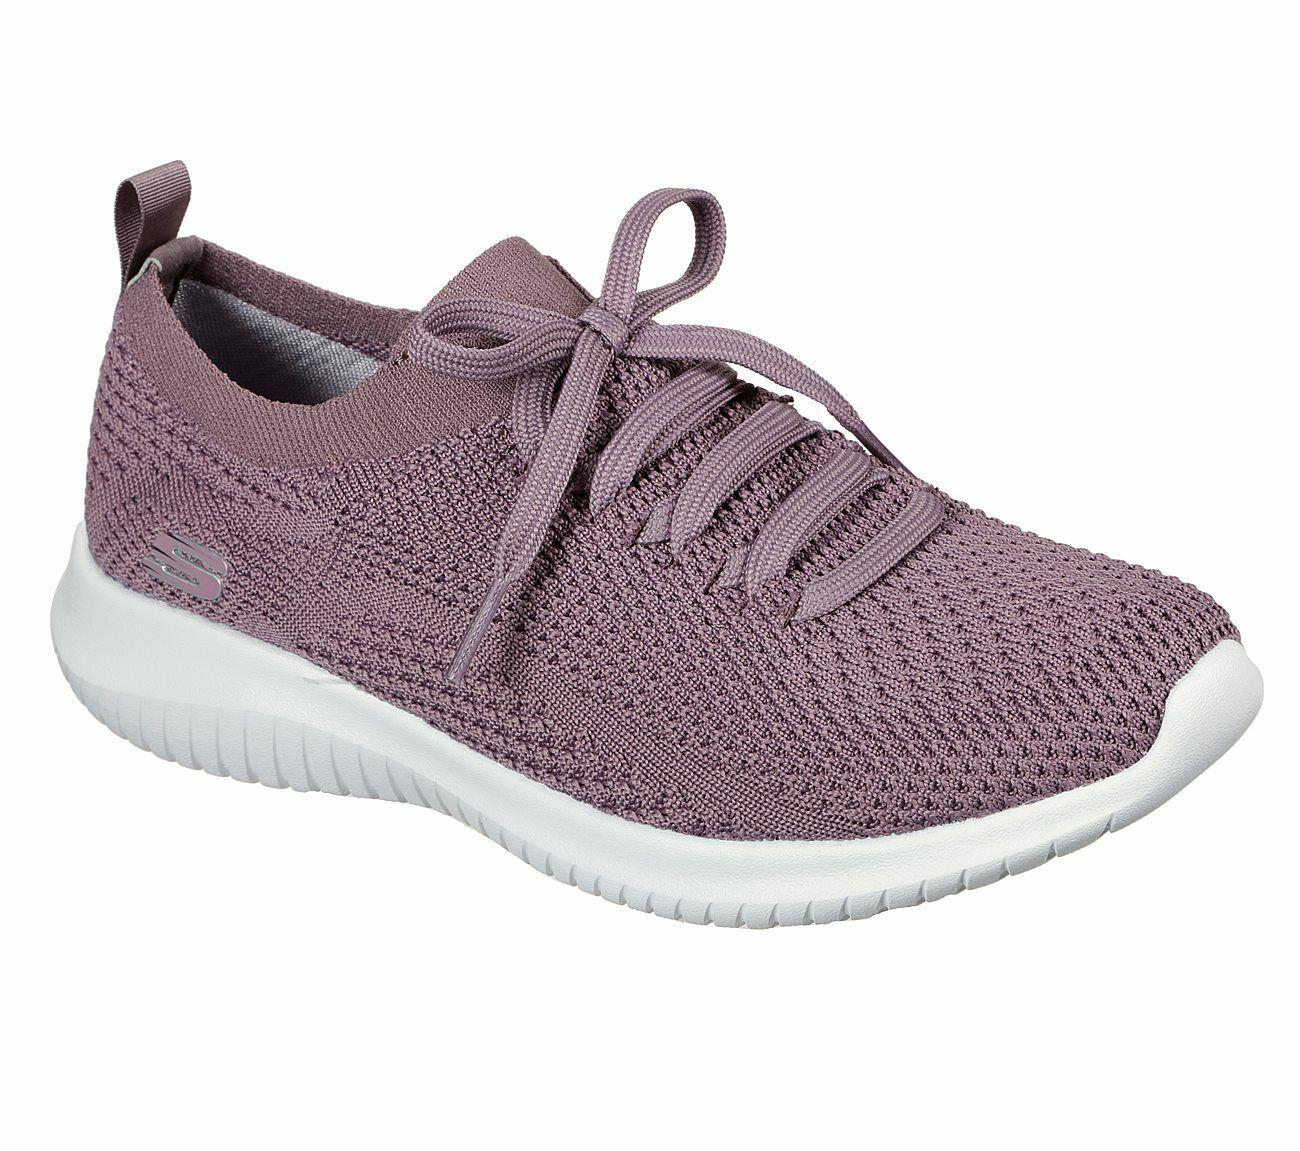 NEU SKECHERS Damen Sneakers Turnschuhe Training Sport Walking ULTRA FLEX Violett